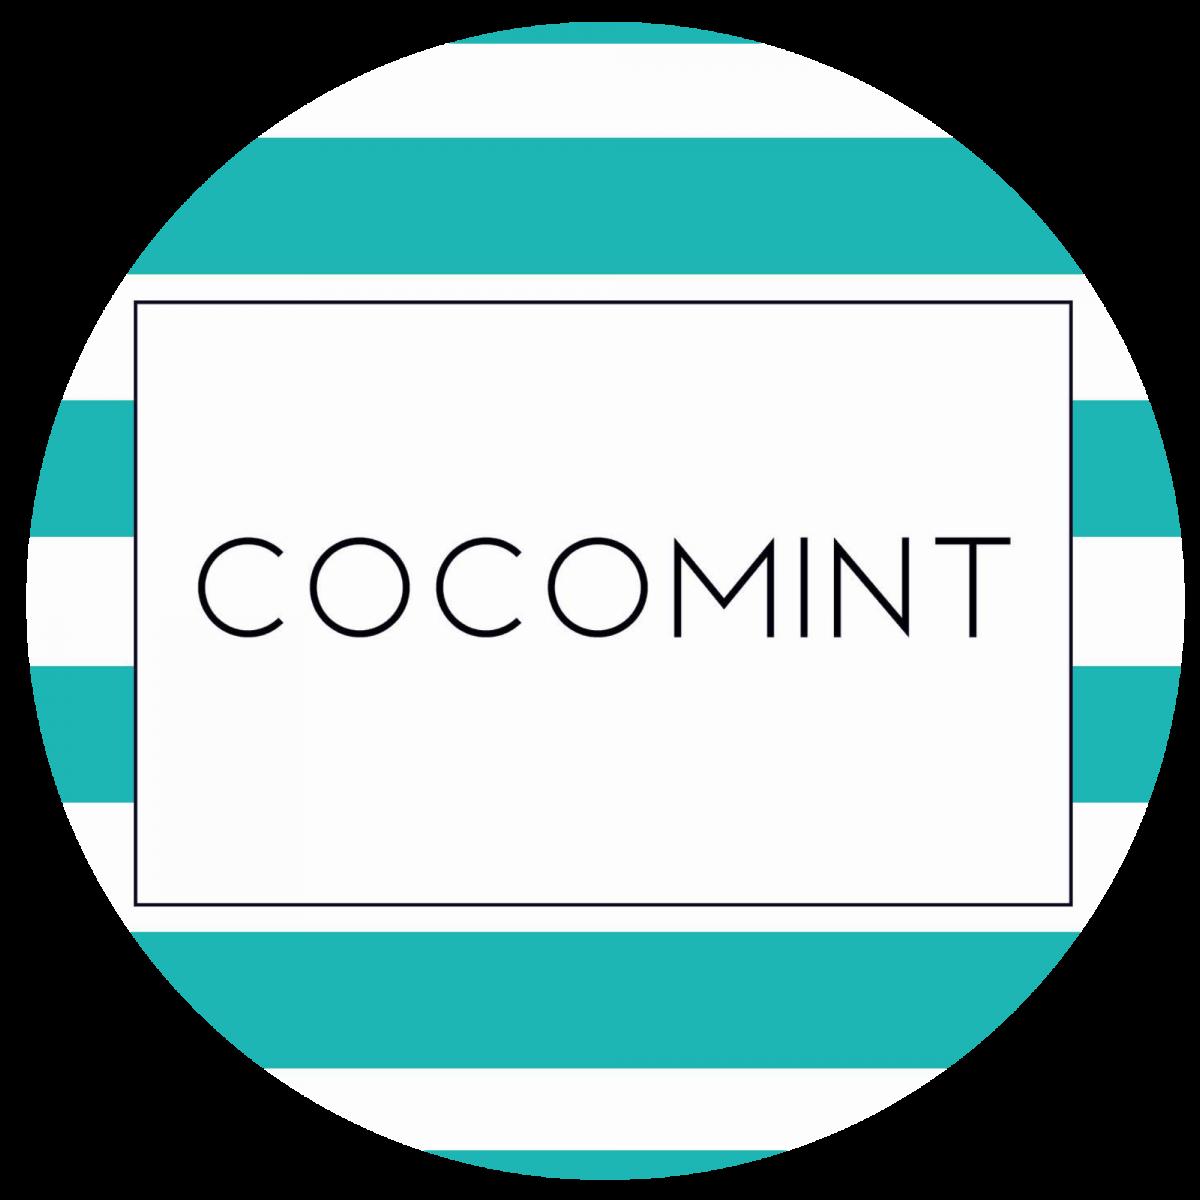 COCOMINT